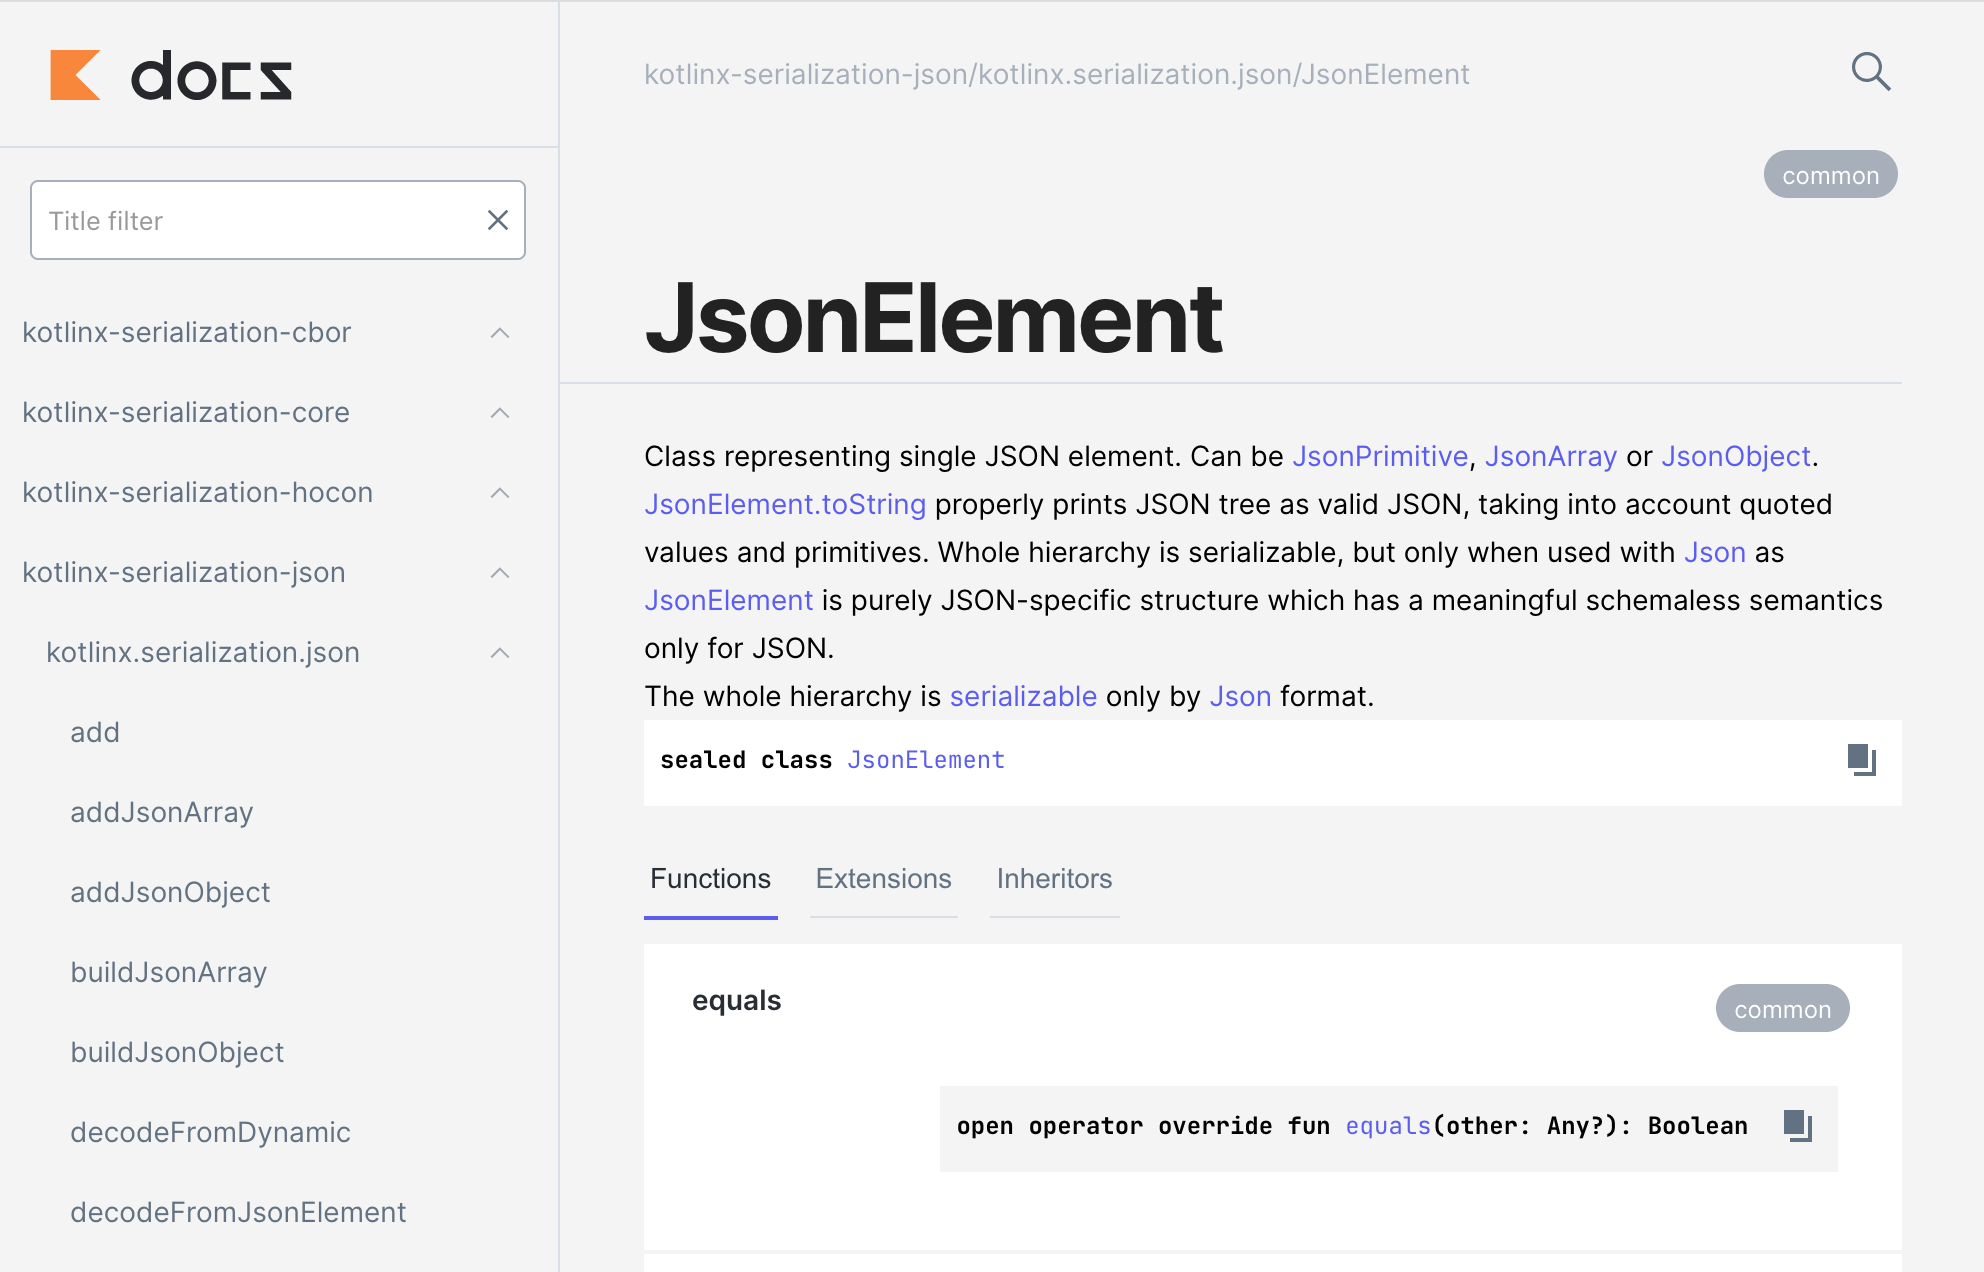 Example of the new API docs, showing the JsonElement documentation